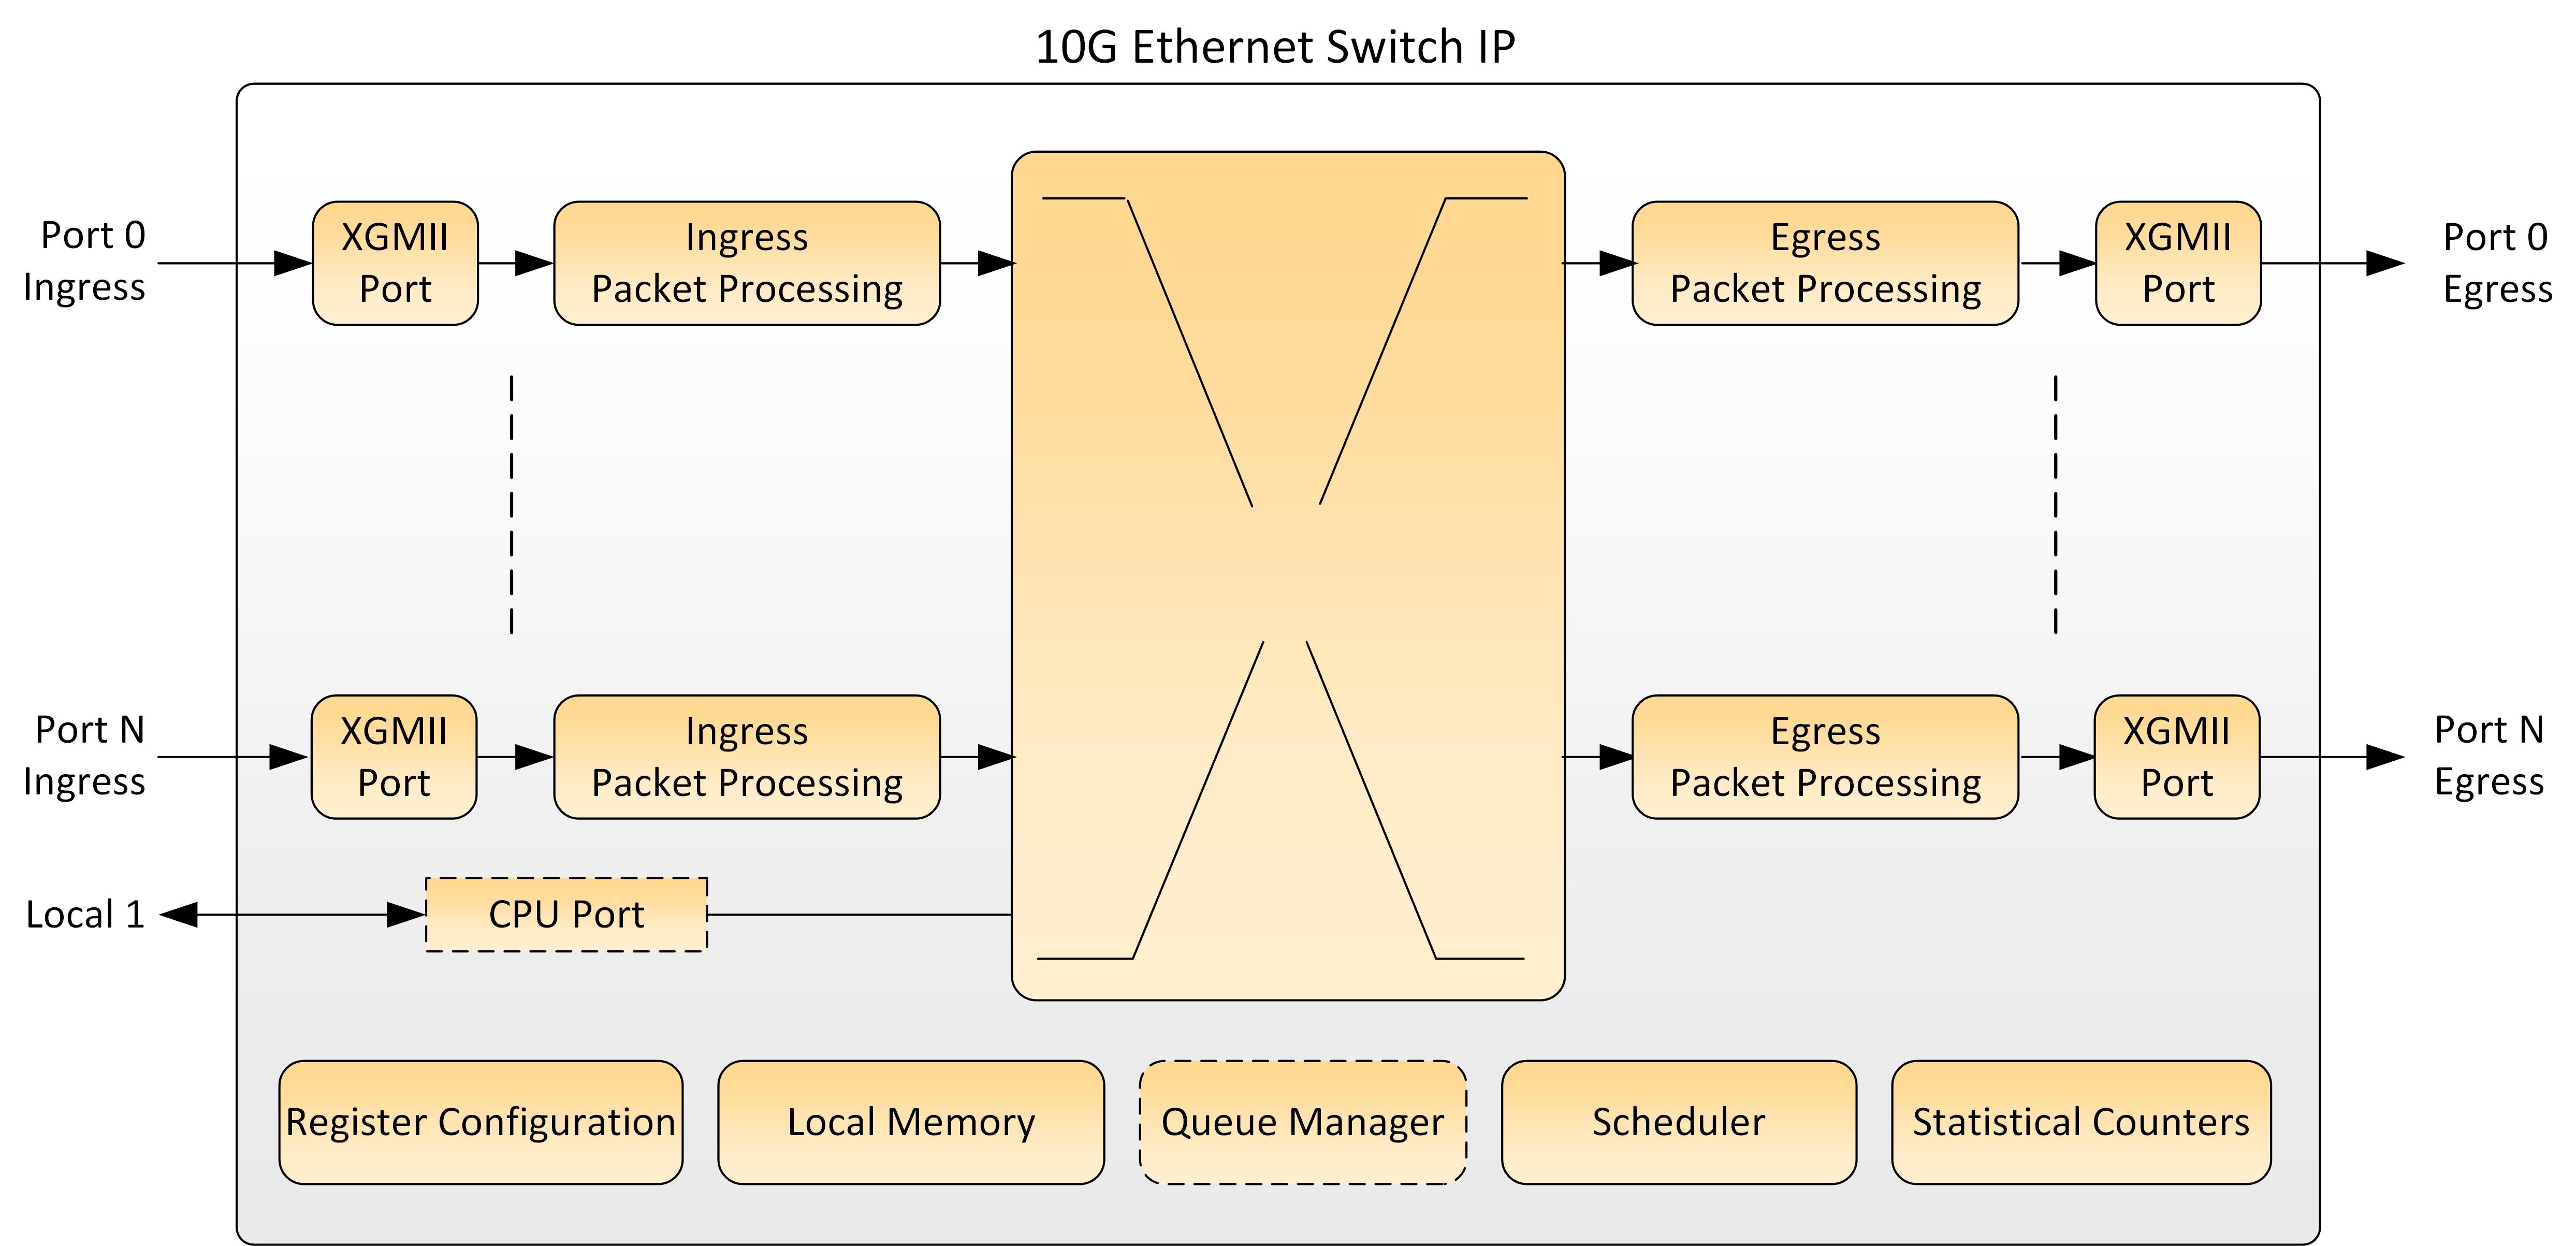 Ethernet Switch 10G Block Diagram